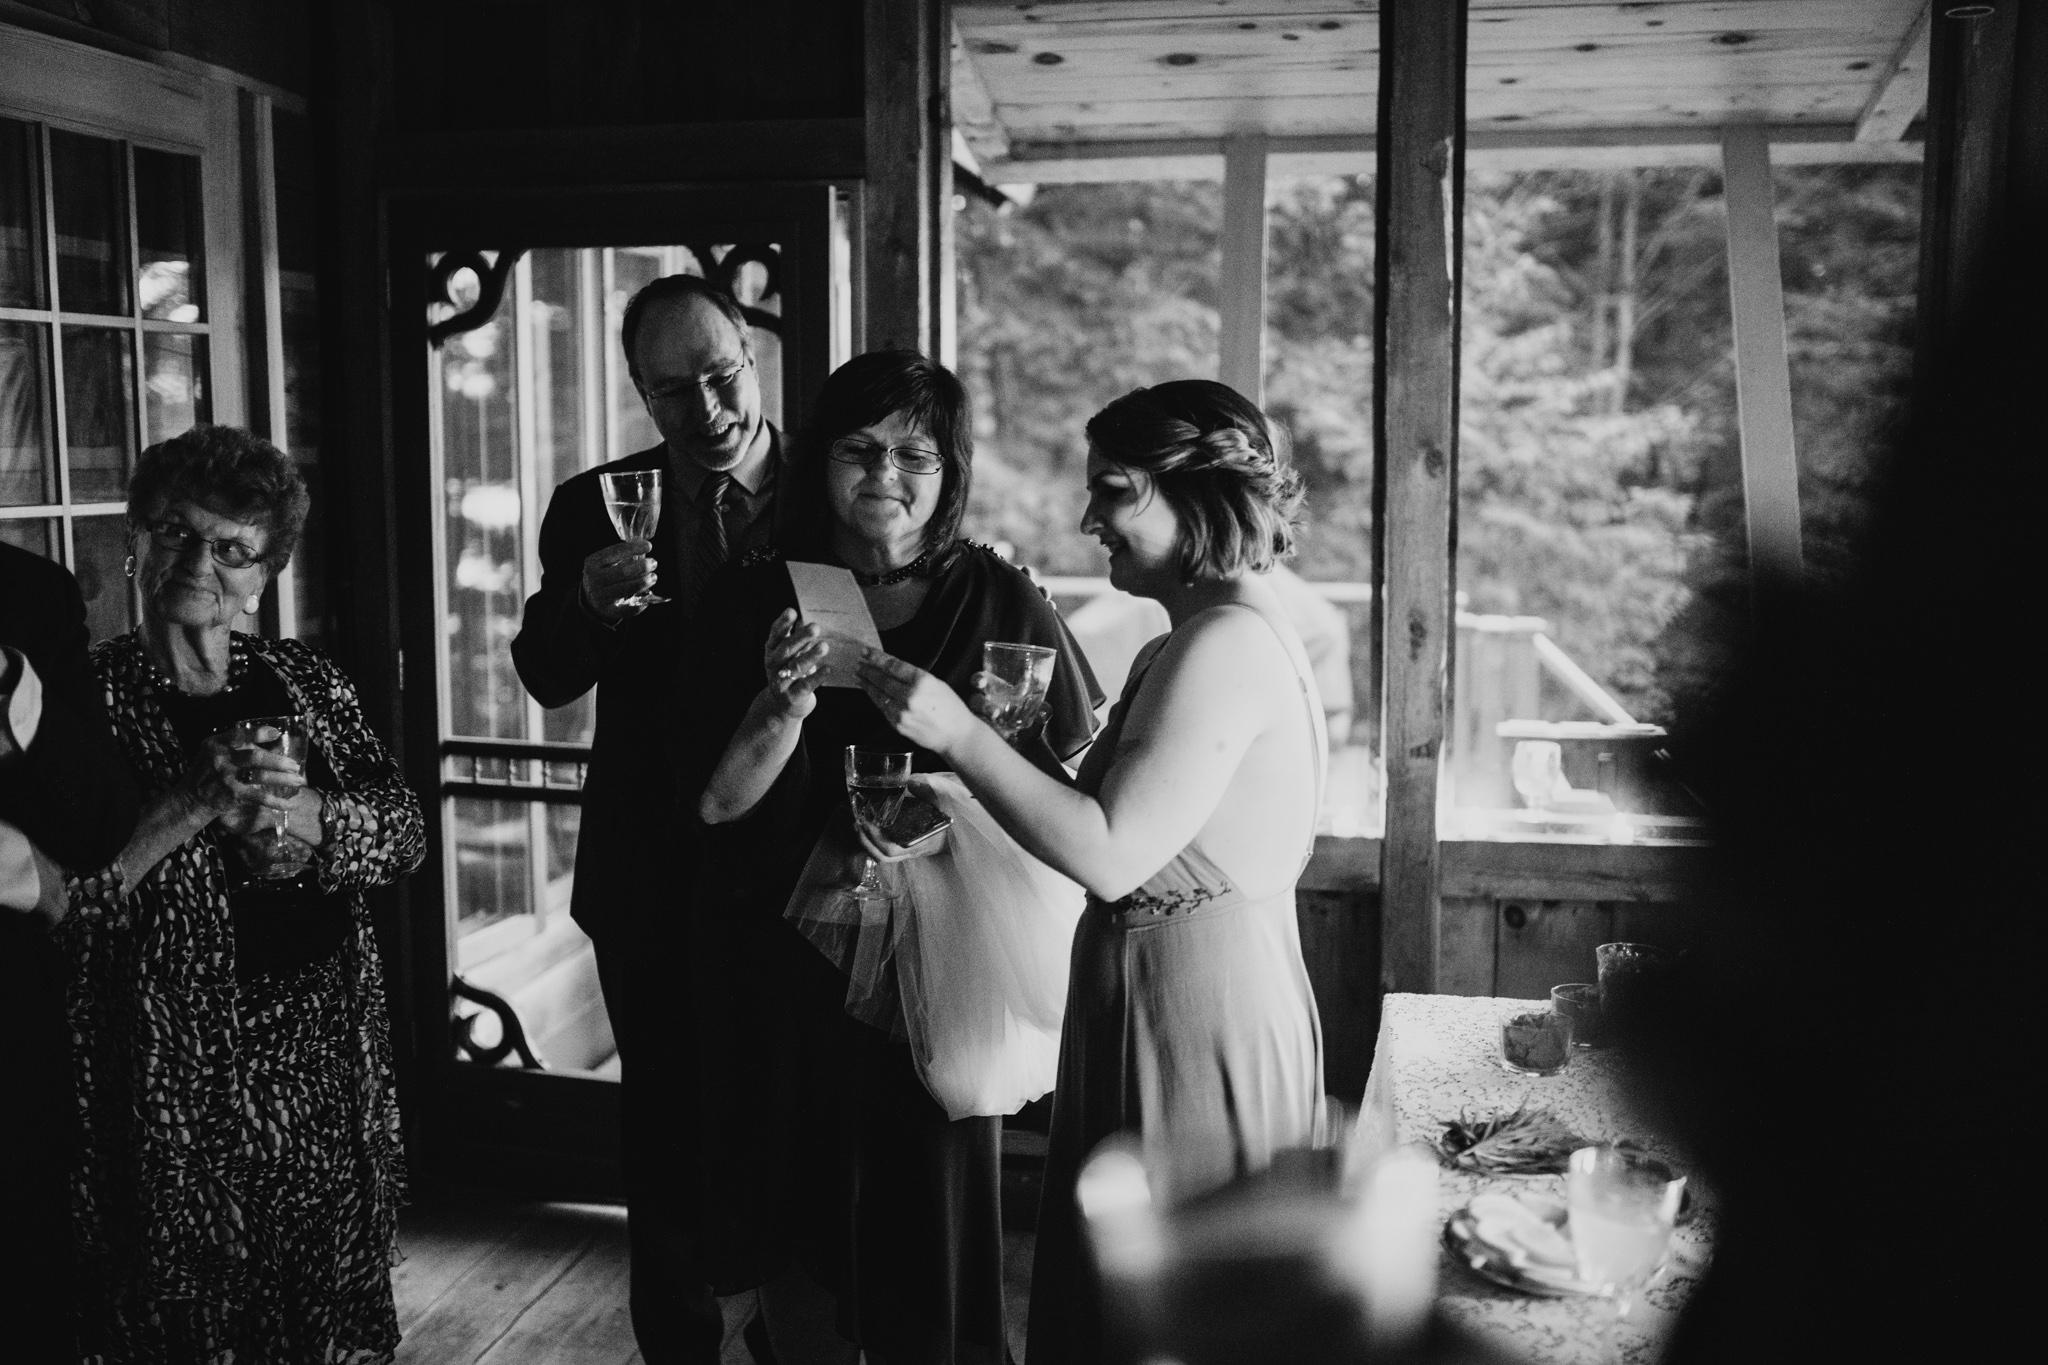 421-WEB-Jonathan-Kuhn-Photography-Taylor-Noah-Wedding-1647.jpg